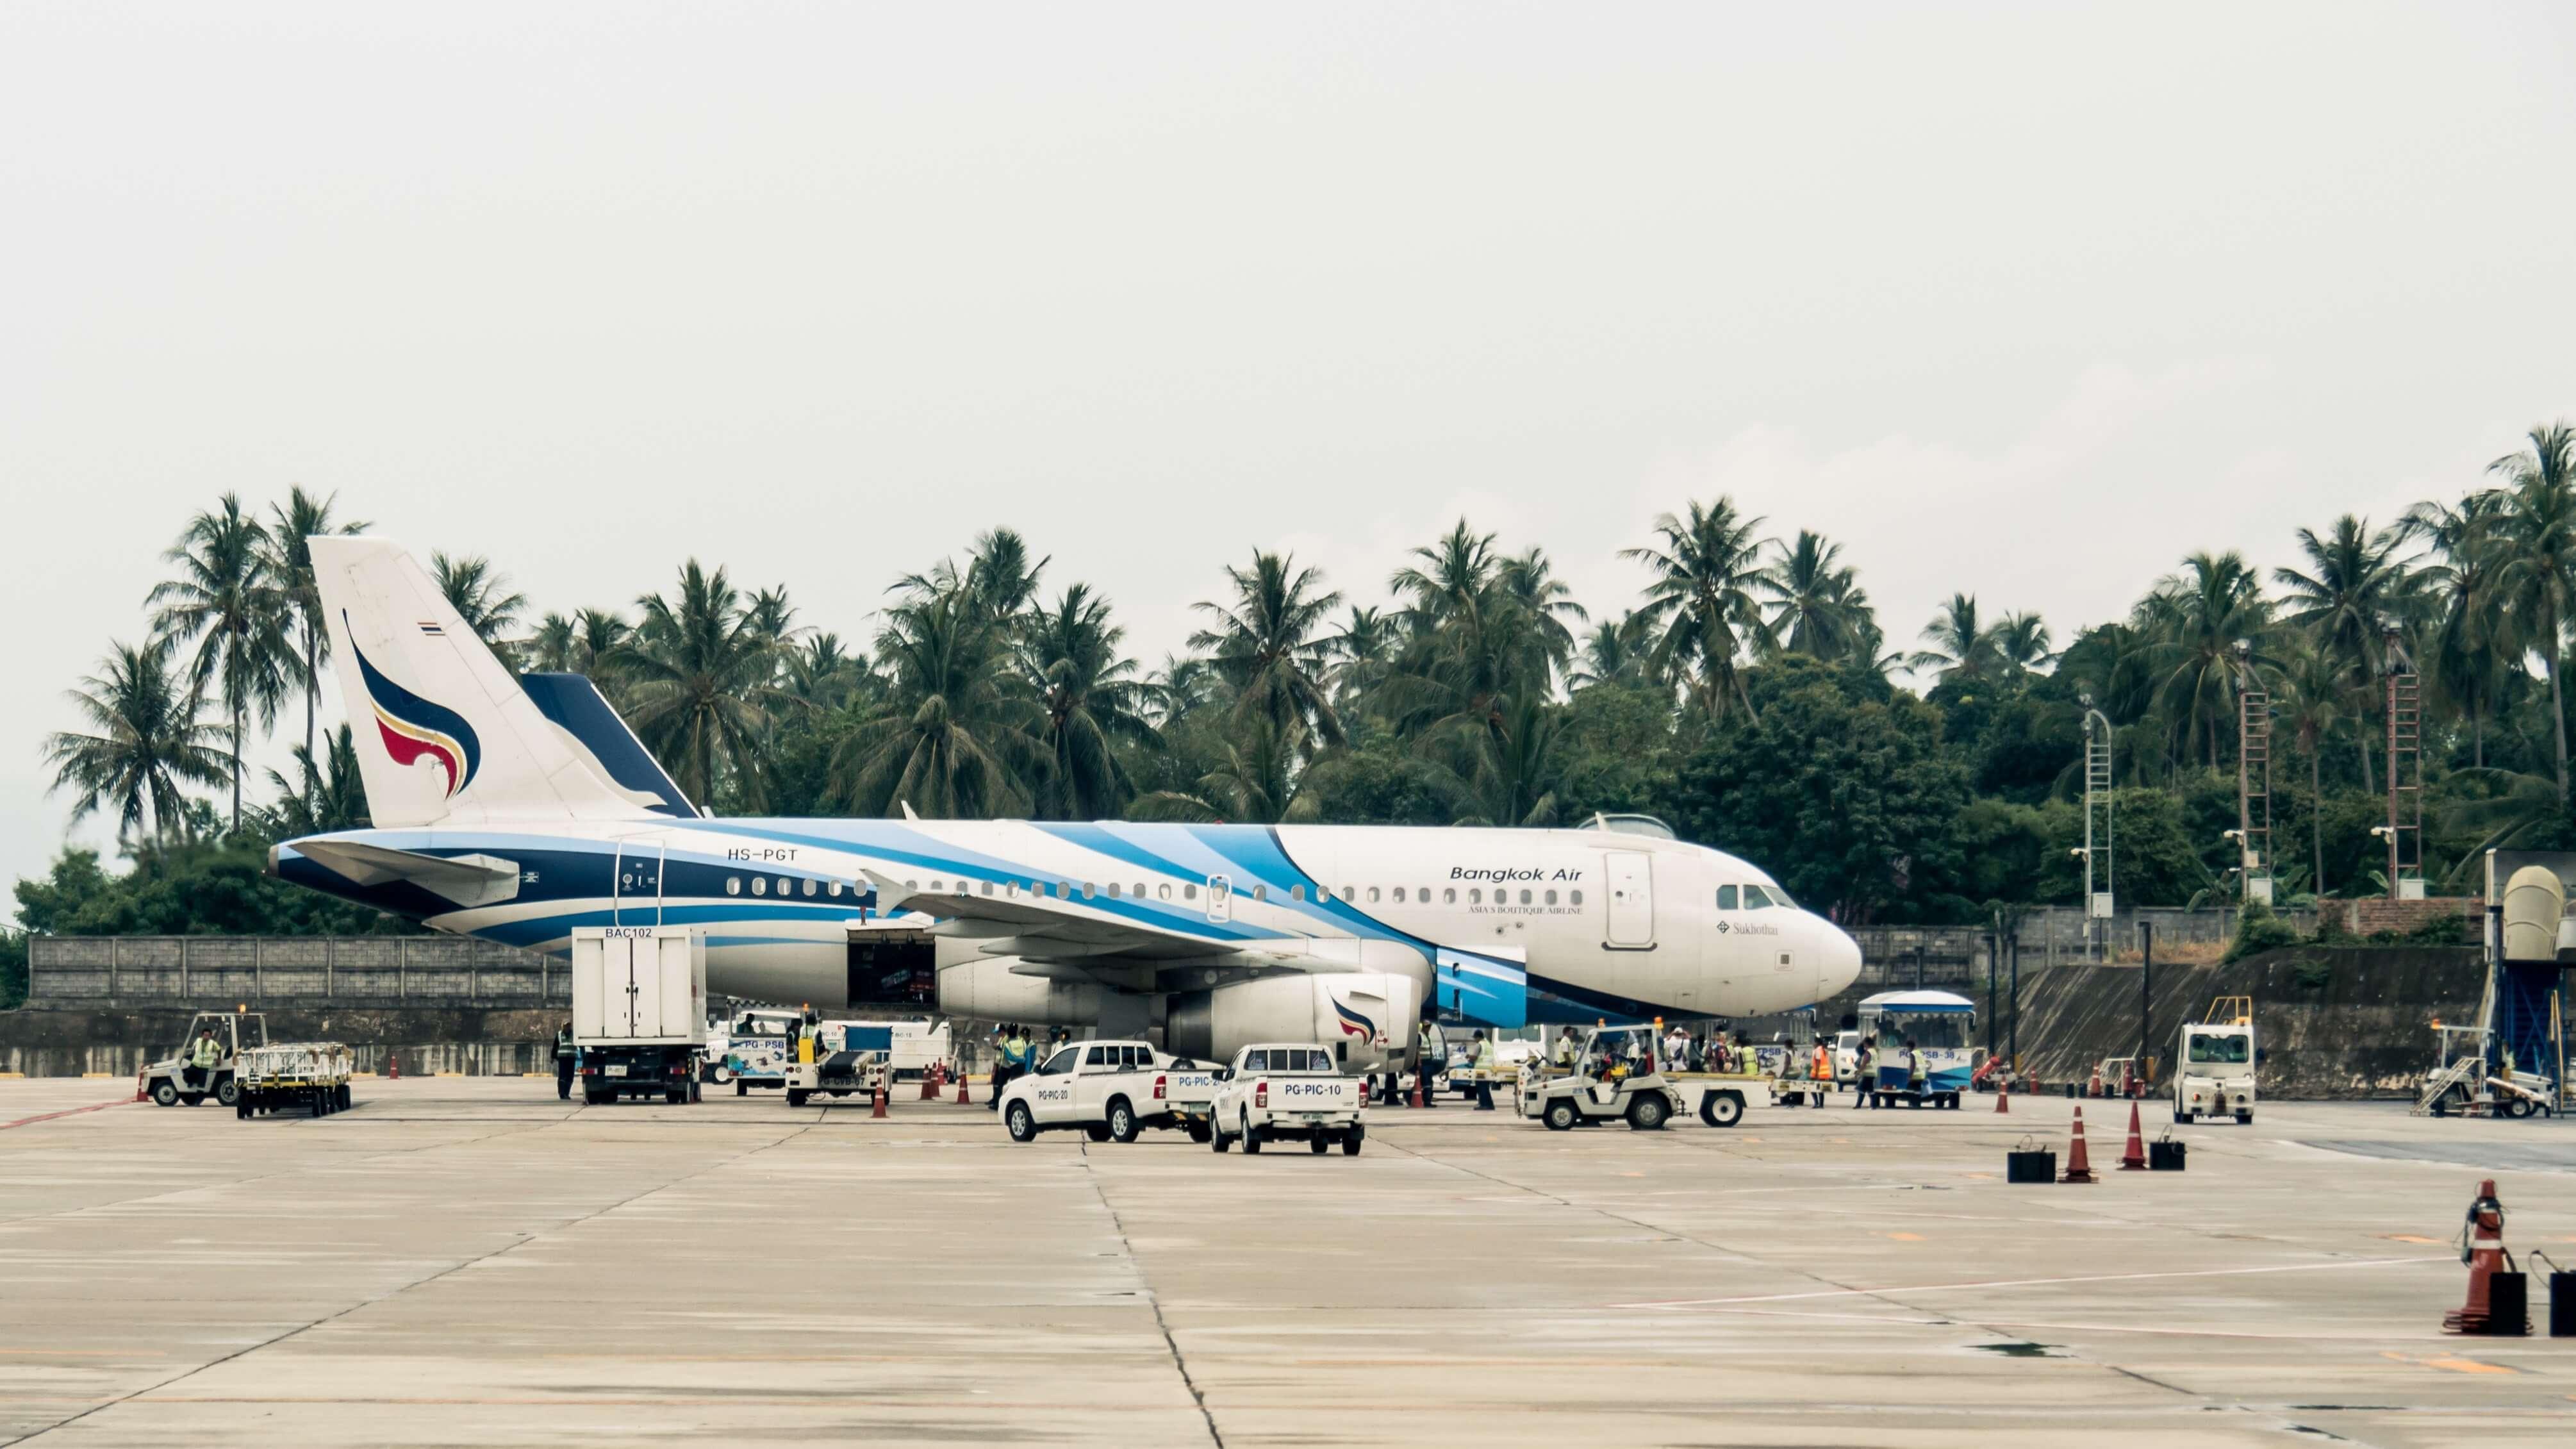 Bangkok Airways USM Airport Koh Samui